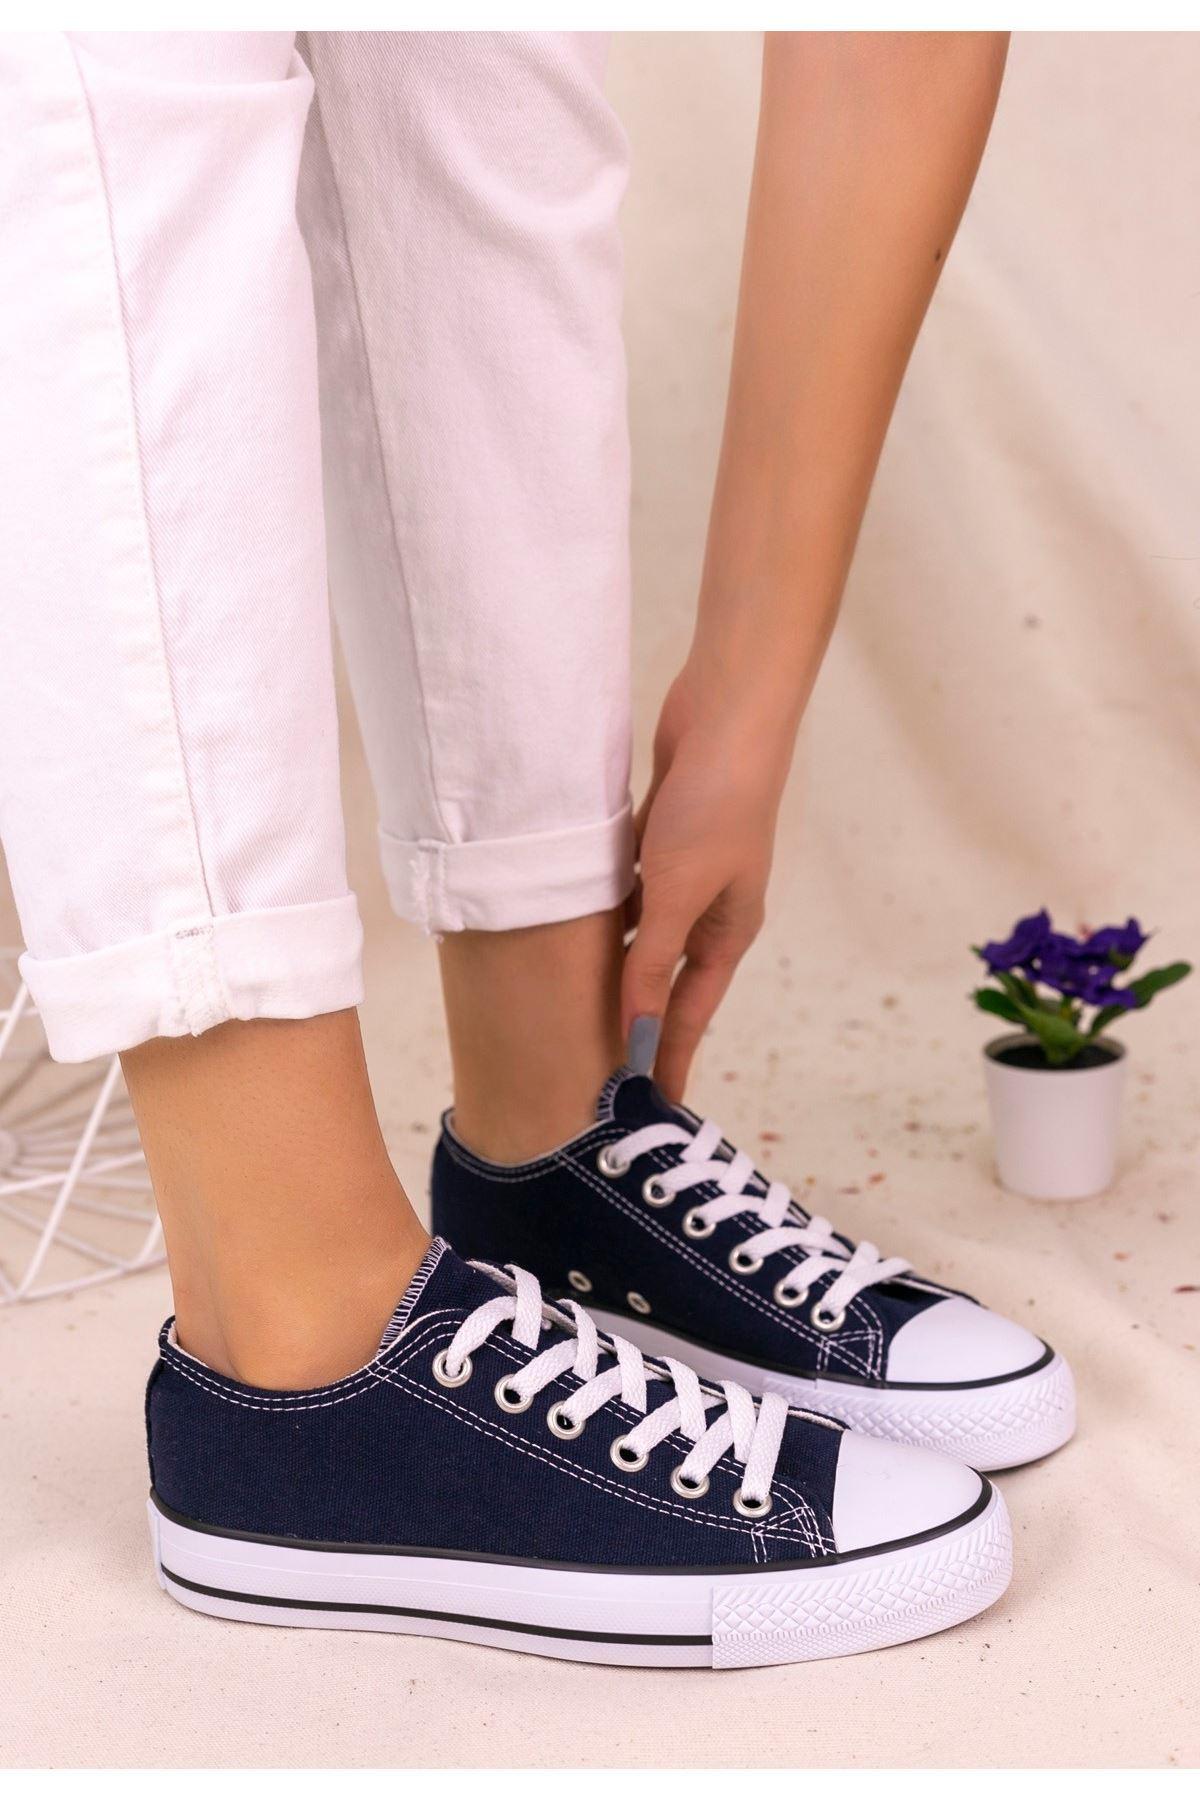 Moxi Lacivert Keten Spor Ayakkabı